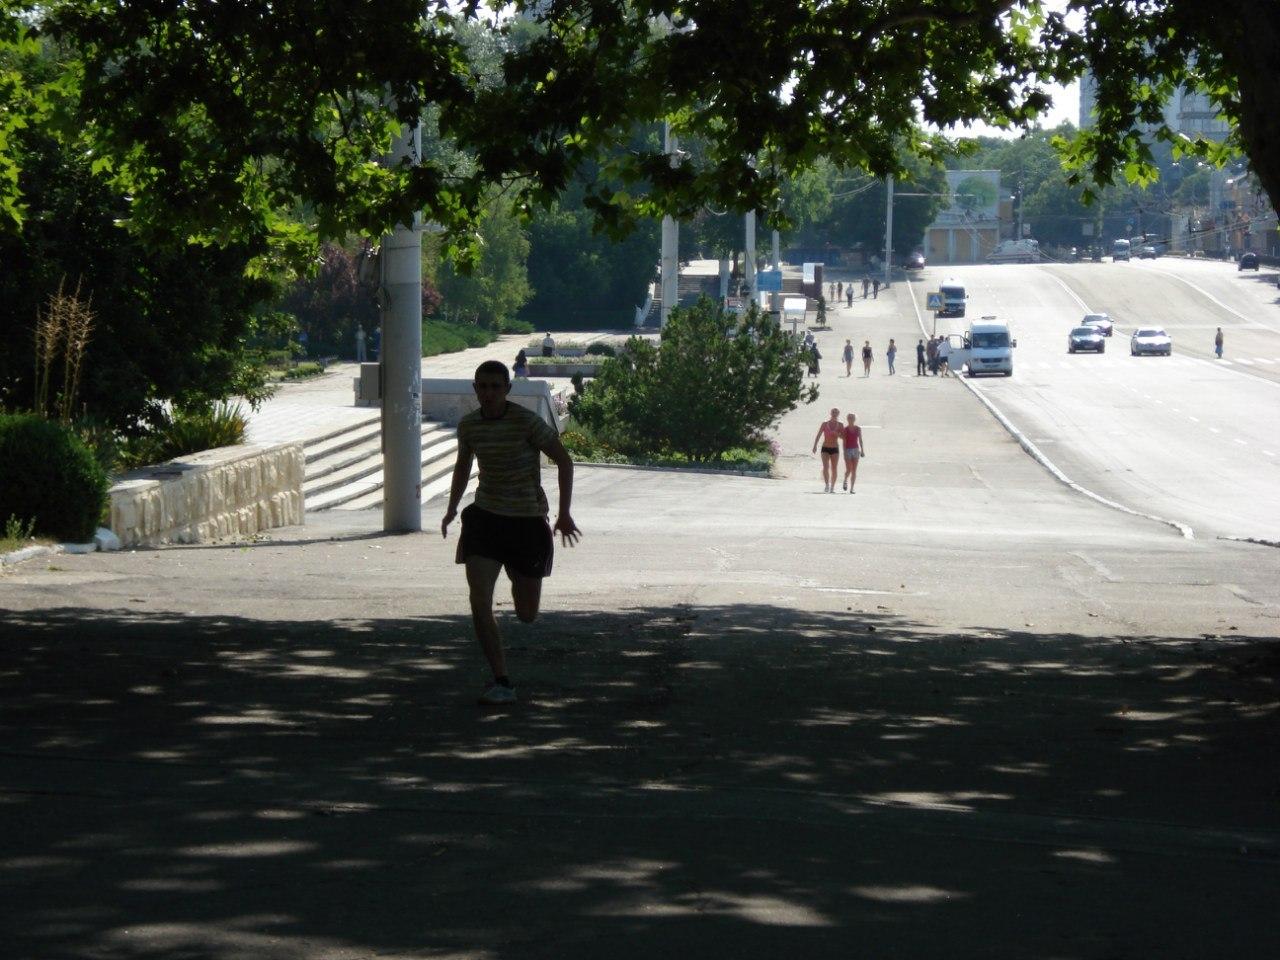 Отчет о Приднестровской Пробежке (1.07.2012) от Виталия